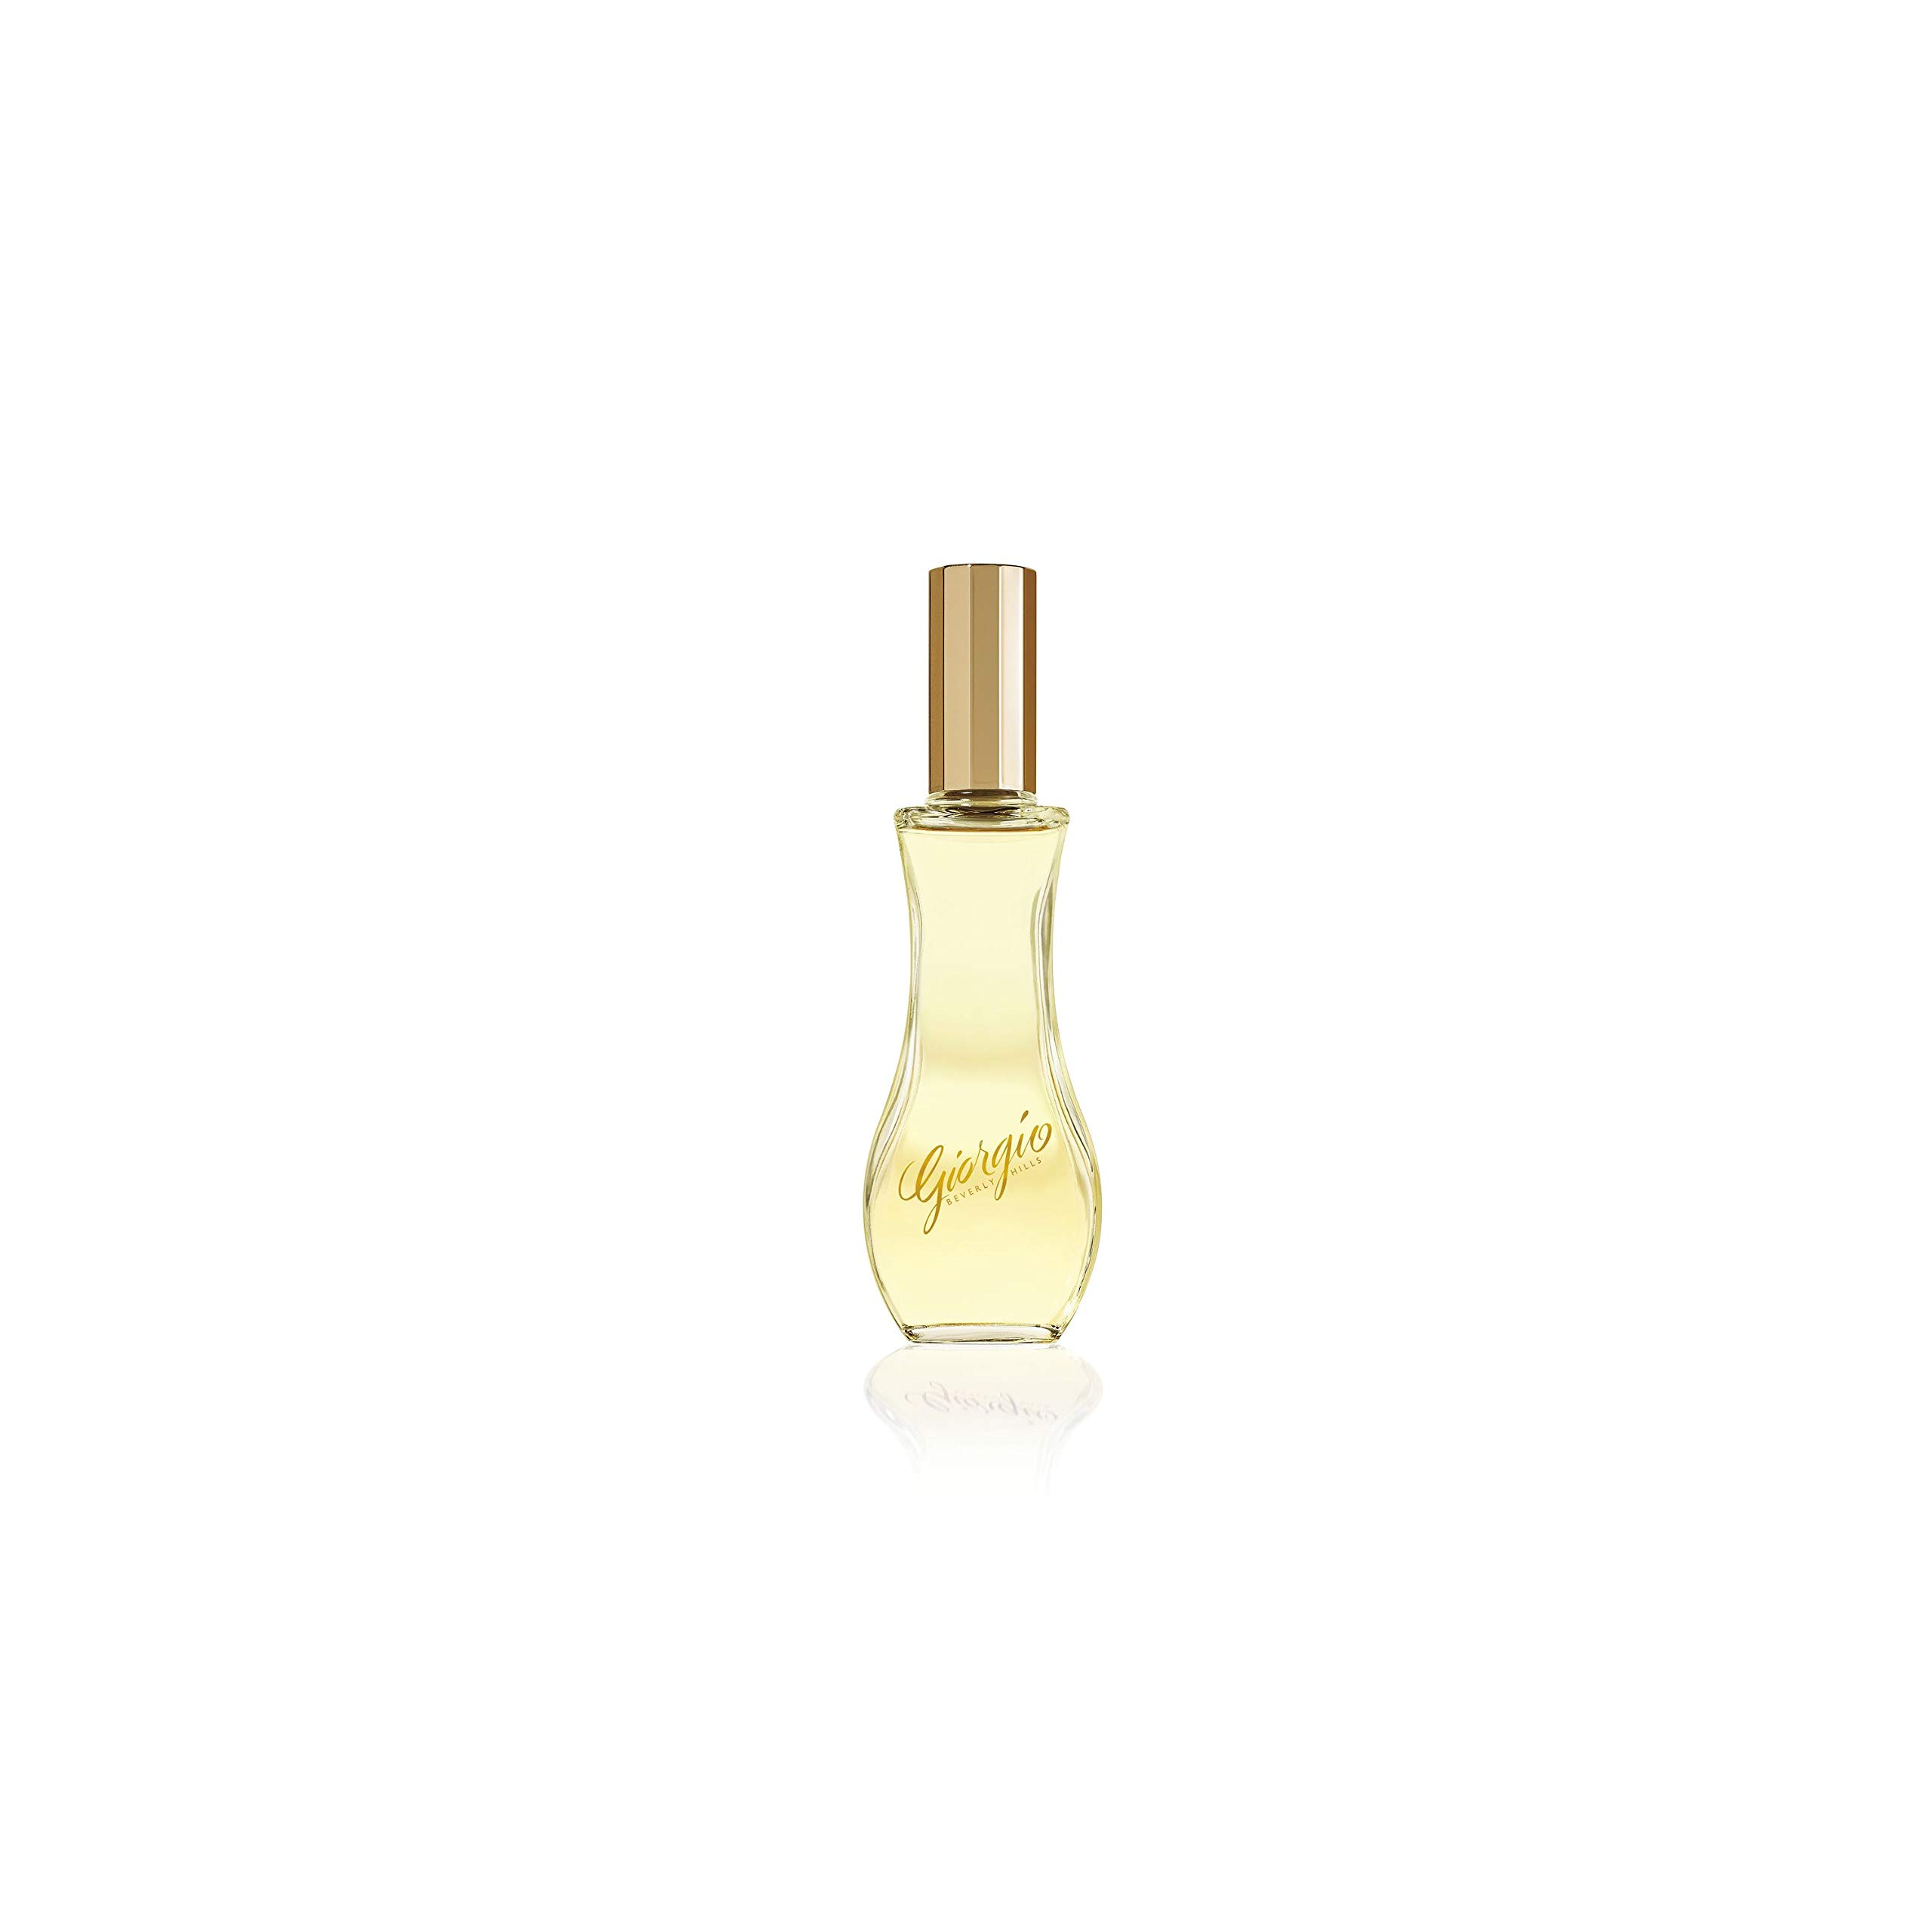 Giorgio Beverly Hills By Giorgio Beverly Hills For Women. Eau De Toilette Spray 3.0-Ounce by Giorgio Beverly Hills